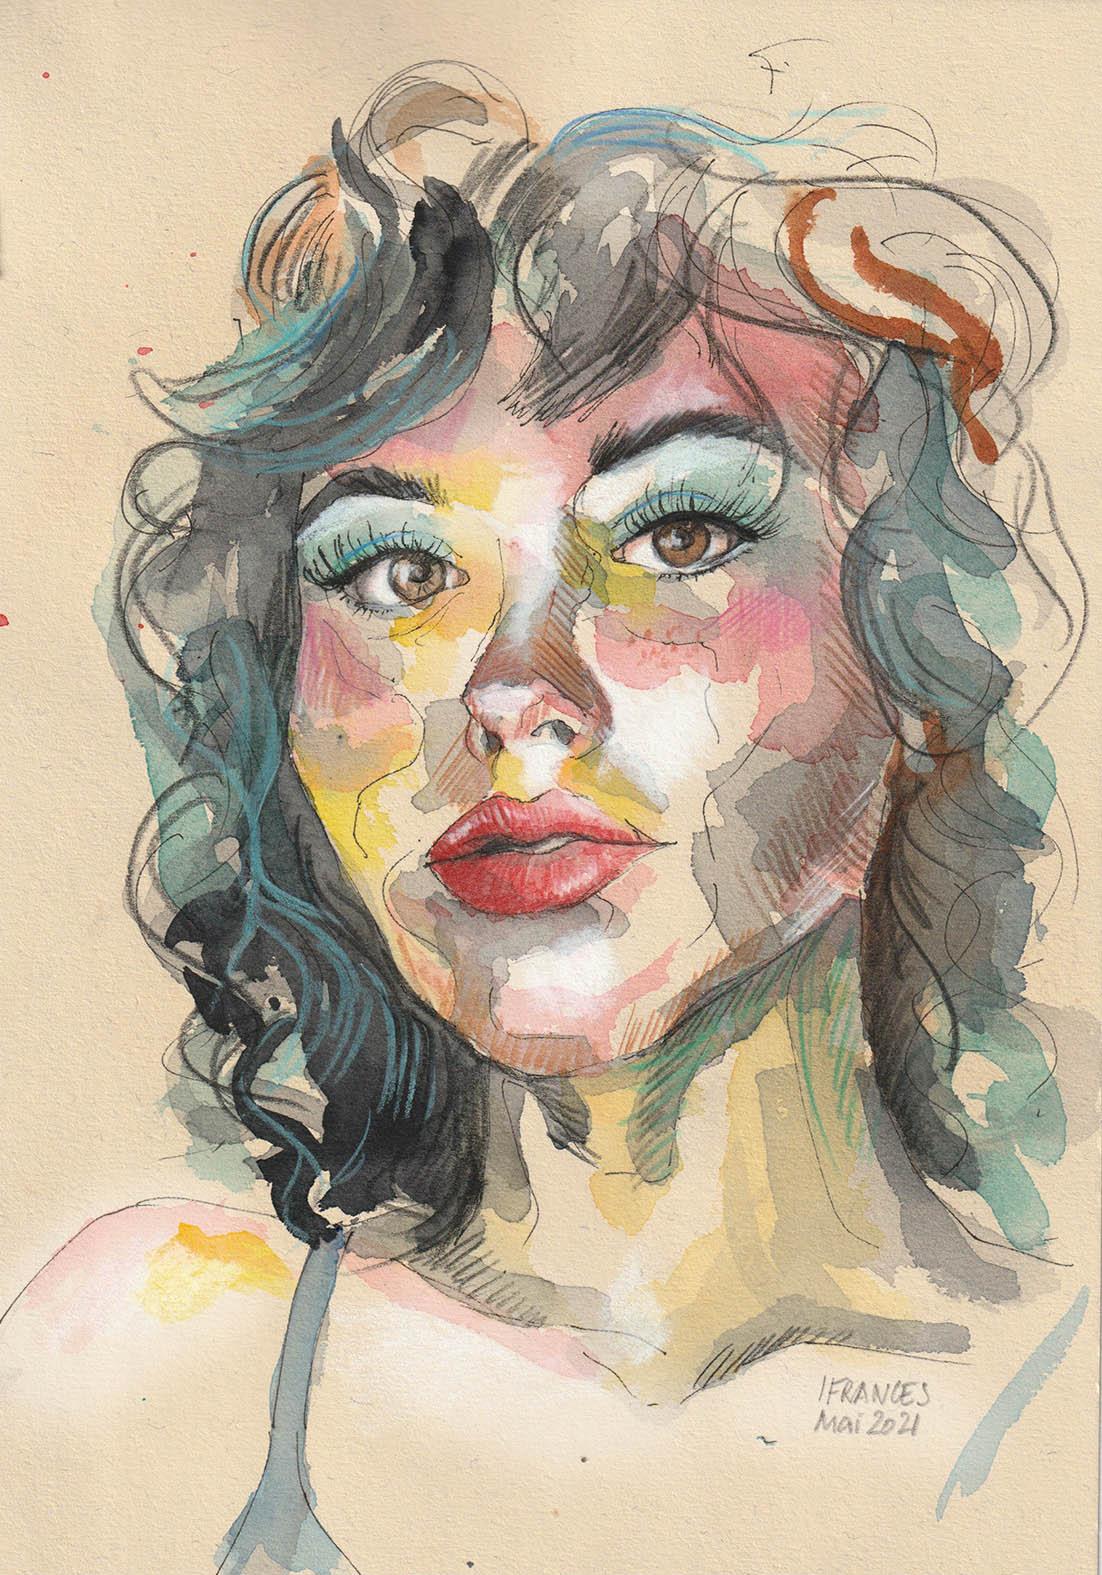 Hannah (Modele Sktchy)- Aquarelle, challenge #30days30faces mai 2021 -©I.Frances